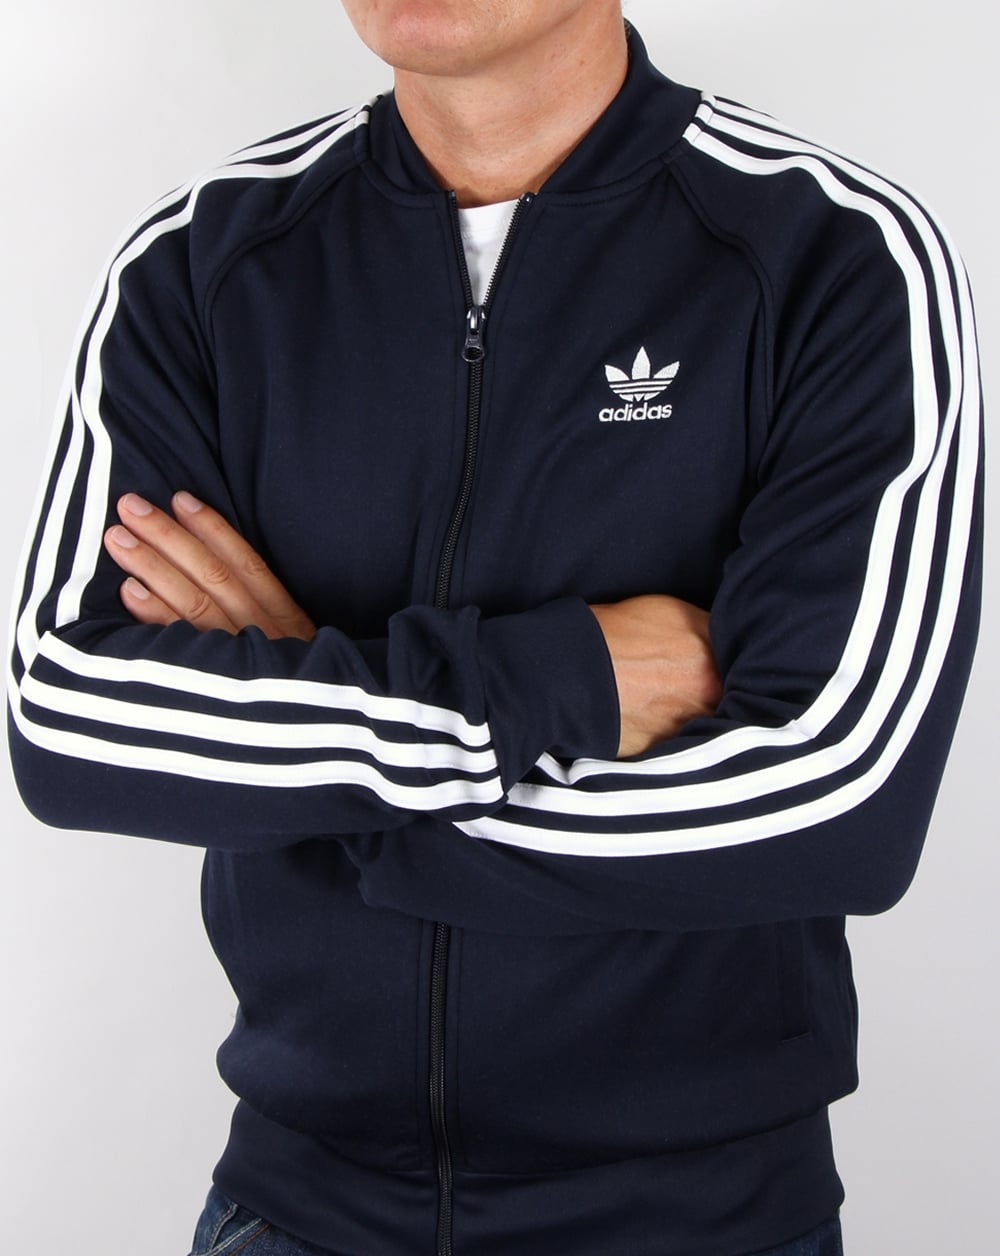 adidas Originals Adidas Originals Superstar Track Top Classic Navy 935b5401a053